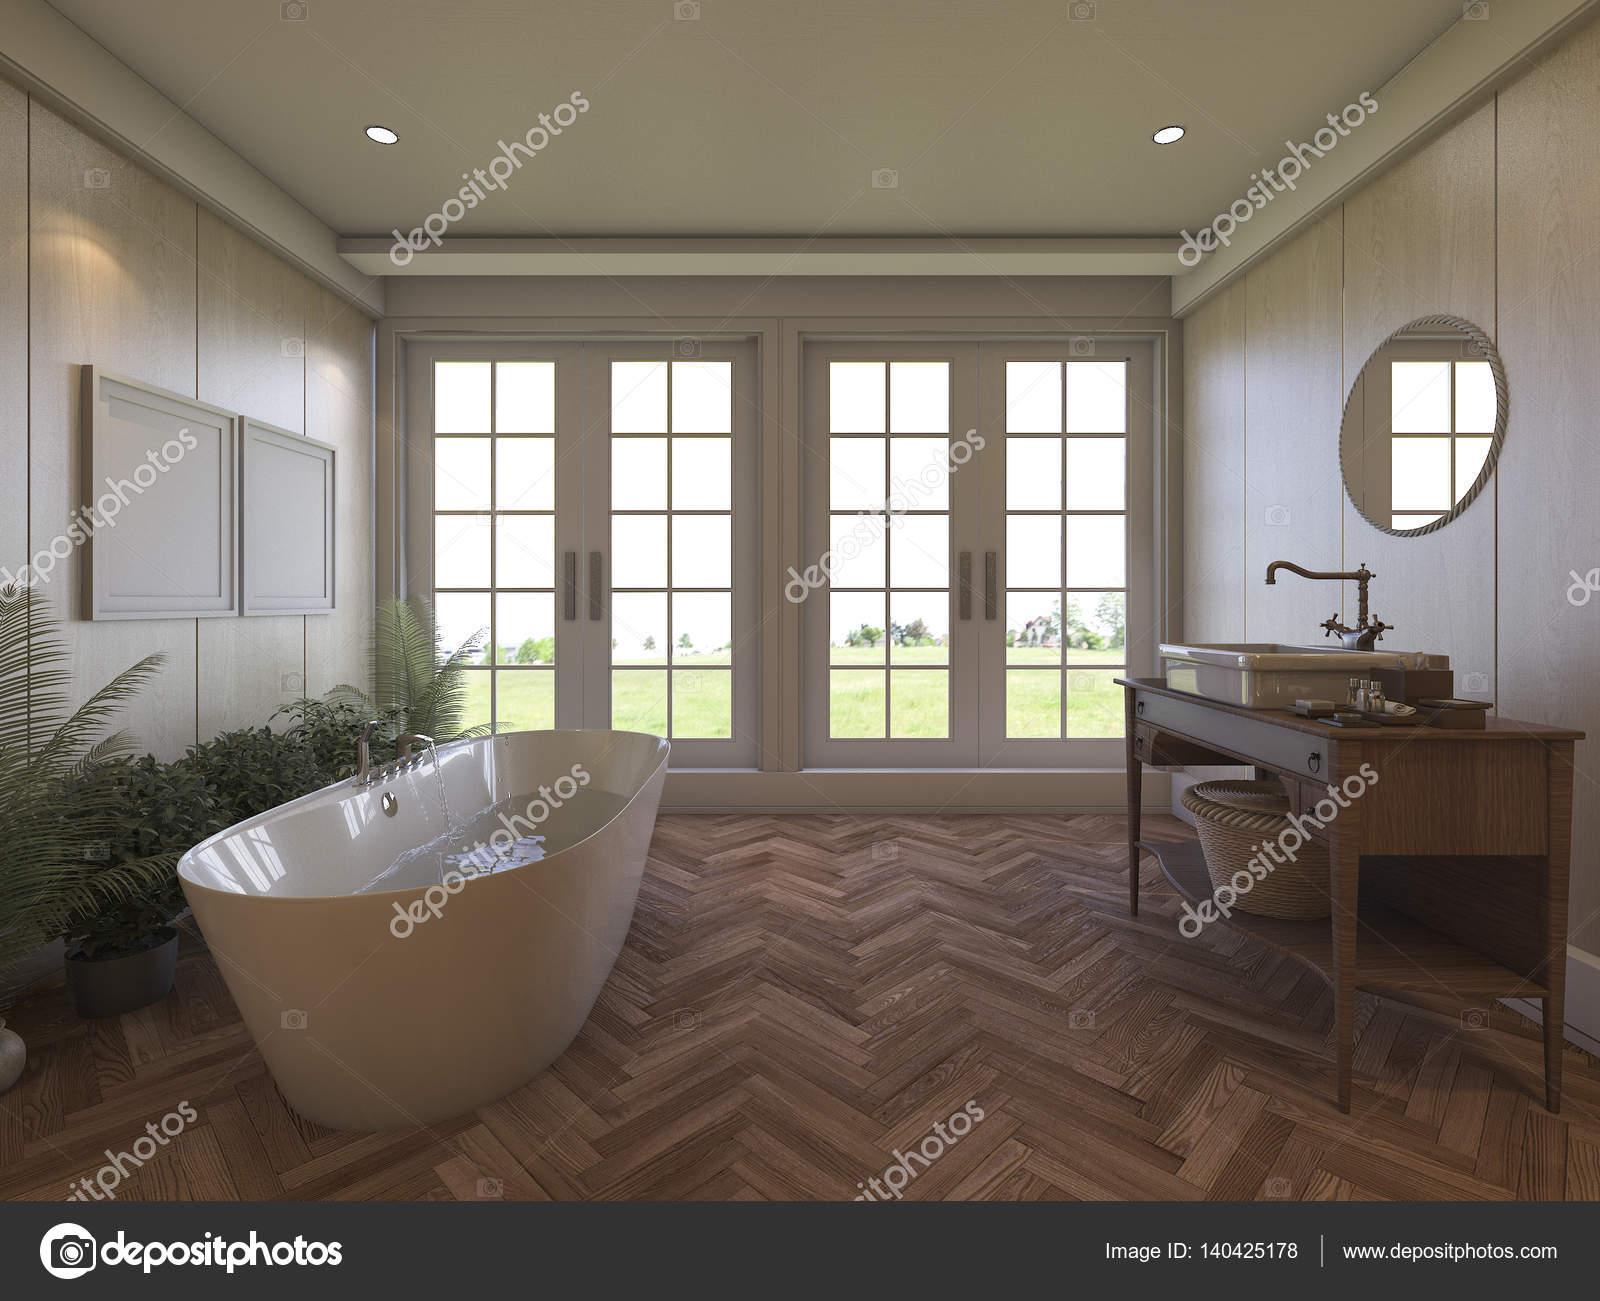 laminat im badezimmer interesting laminat verlegen youtube einzigartig luxus badezimmer deko. Black Bedroom Furniture Sets. Home Design Ideas